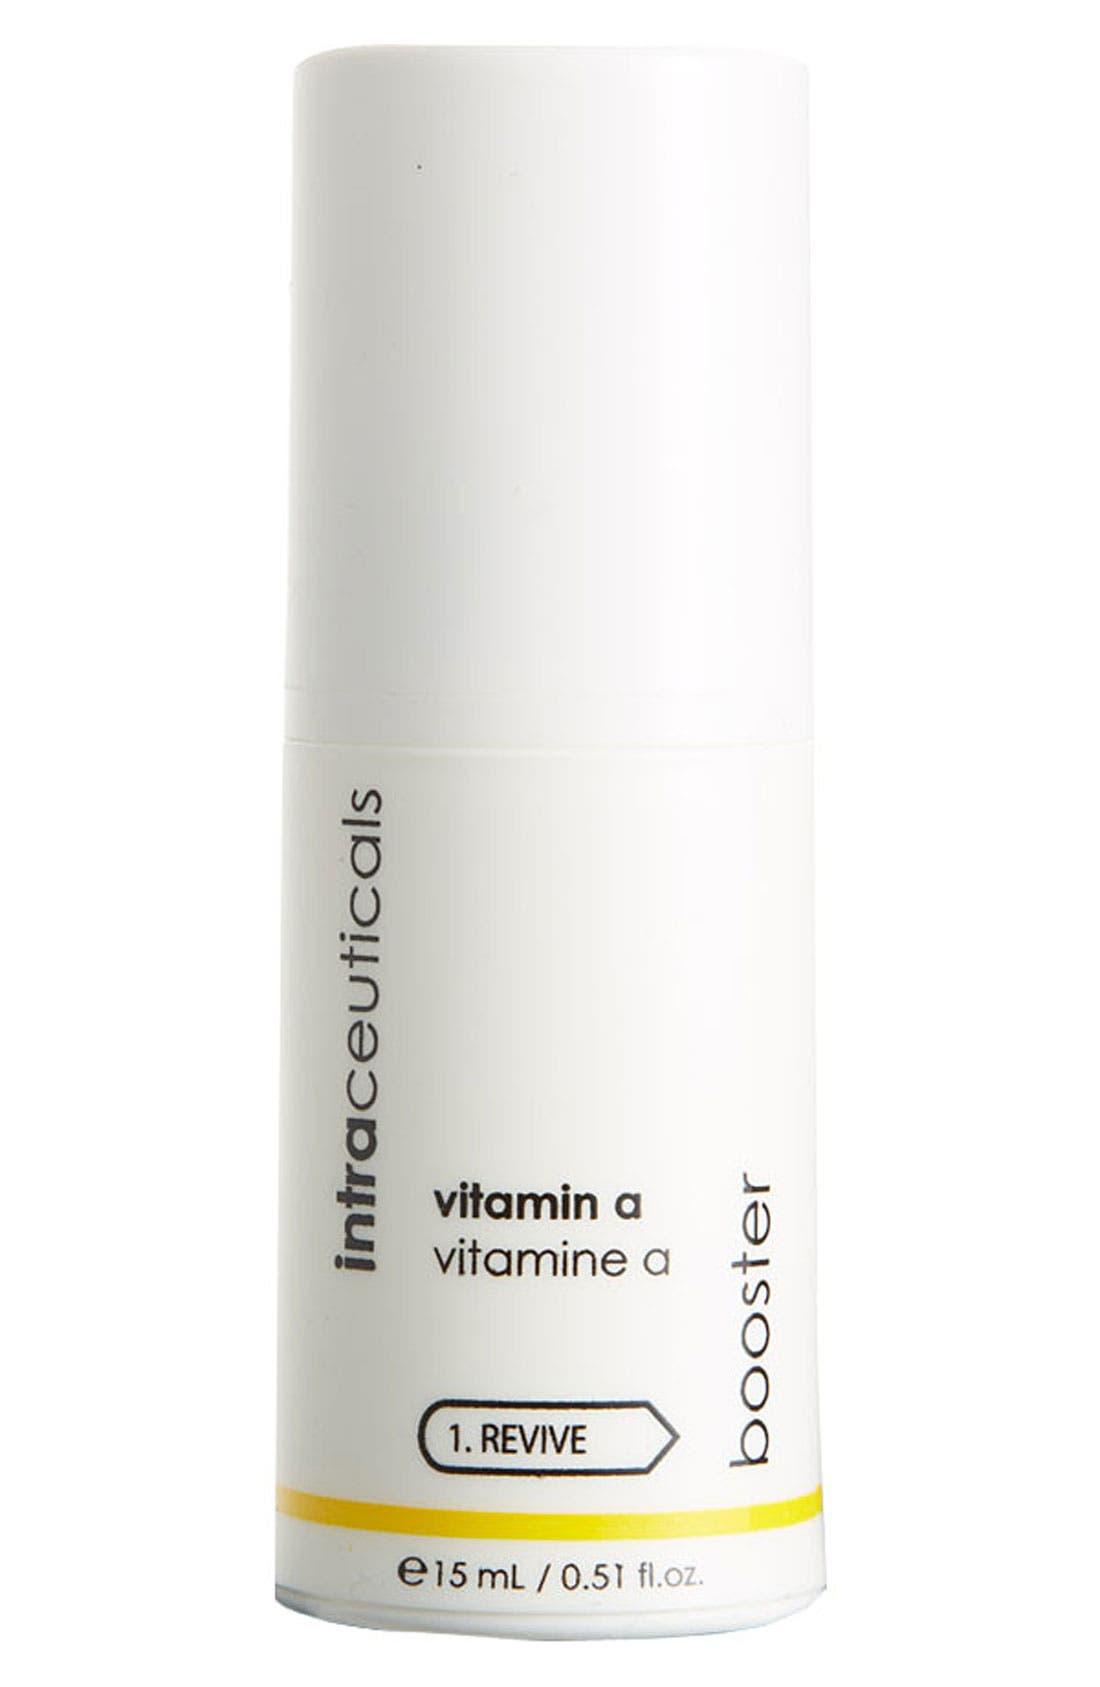 'Booster' Vitamin A Serum,                             Main thumbnail 1, color,                             000